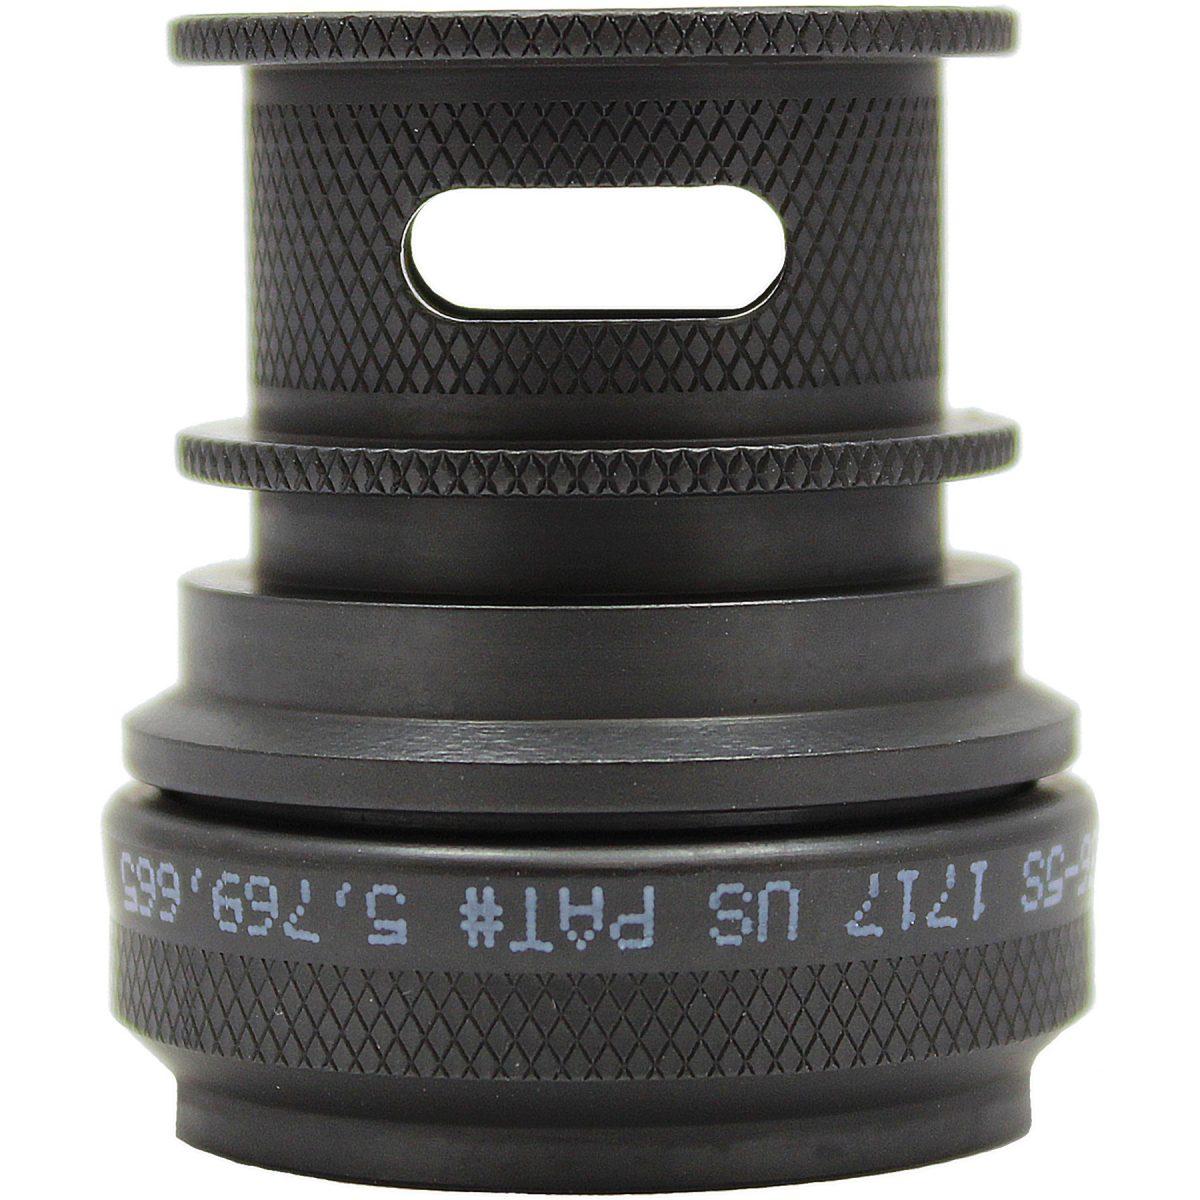 EMI Backshell 150 Series Straight Black Zinc Nickel Chromate